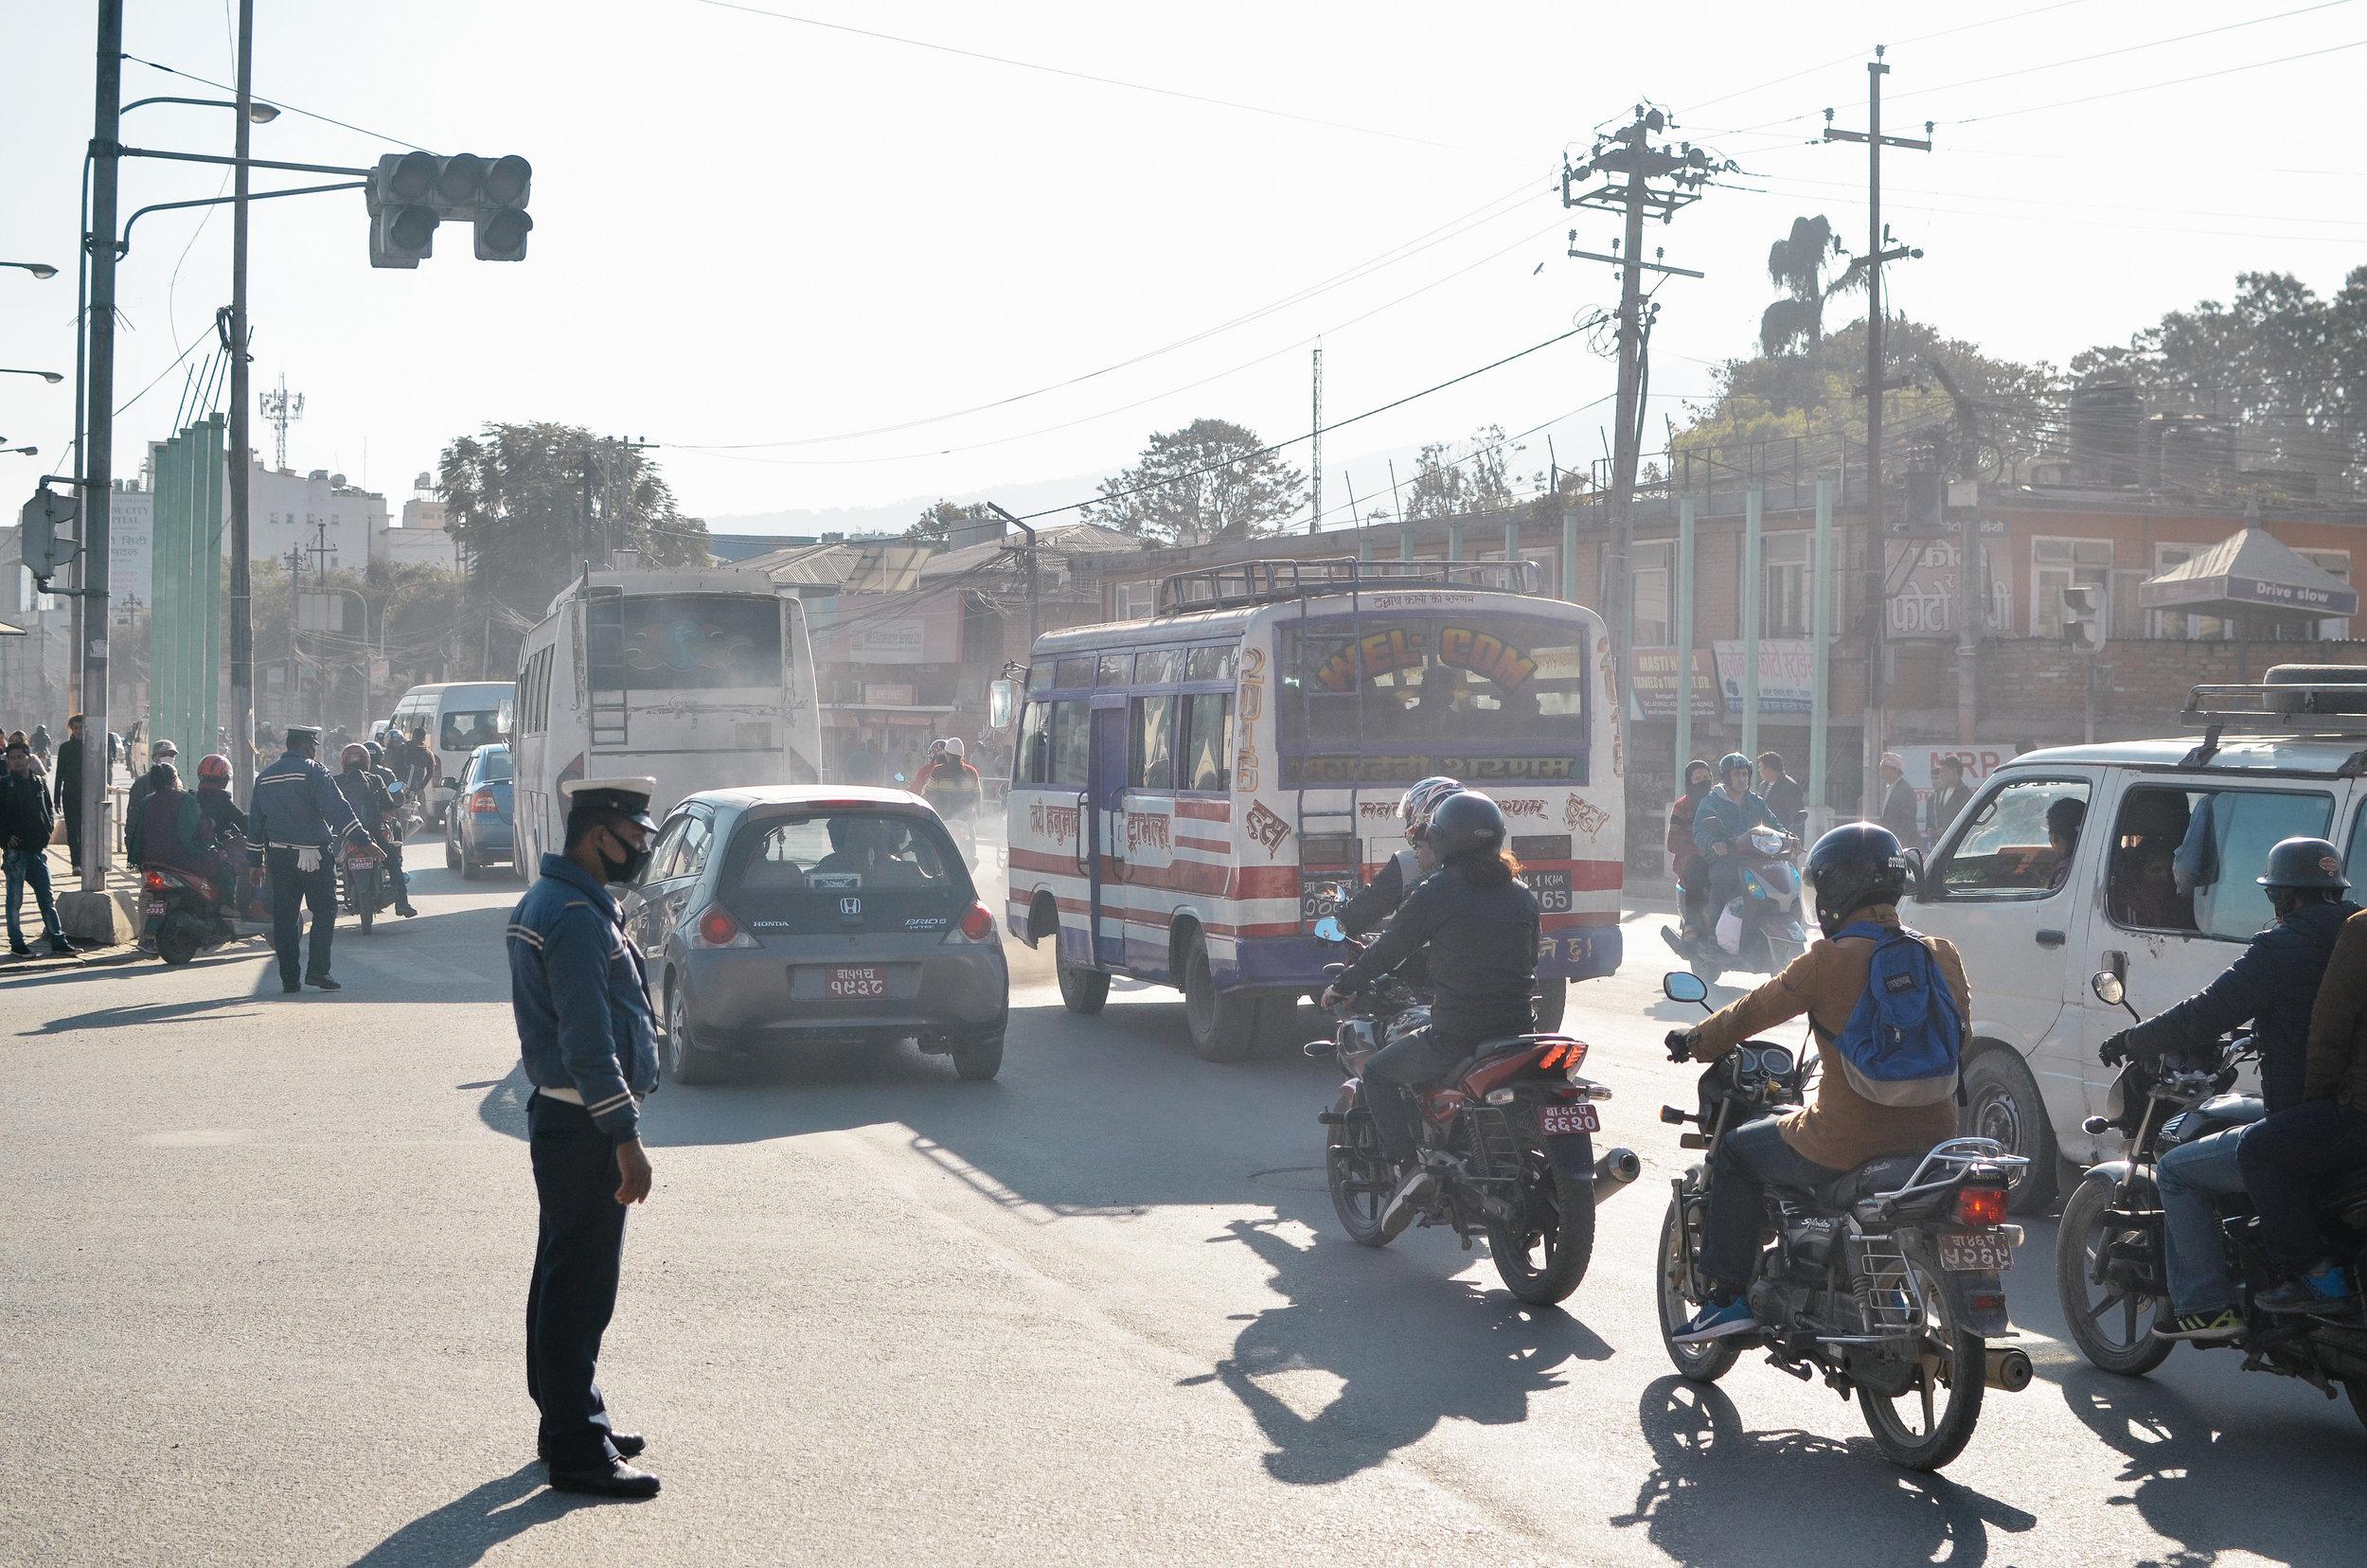 10-things-to-know-kathmandu-nepal-lifeonpine_DSC_0545.jpg